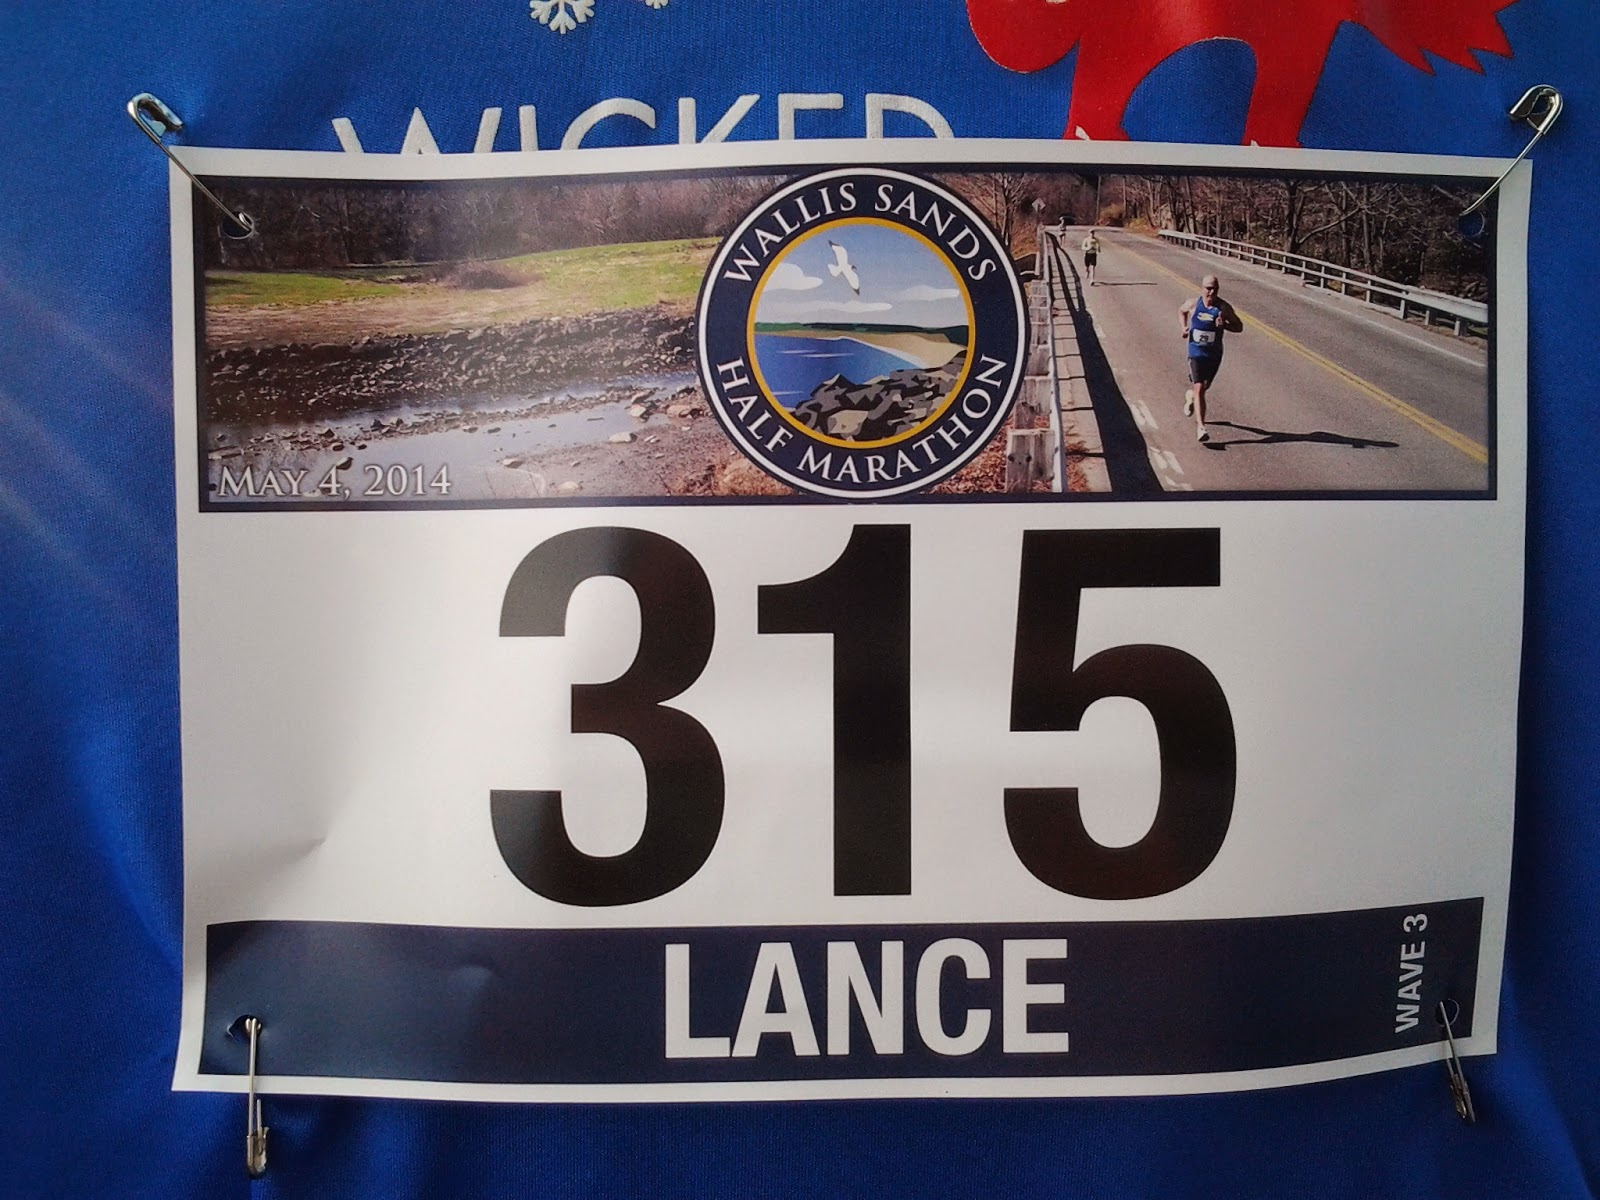 Image: Lance Eaton - Wallis Sands Half Marathon's number: 315